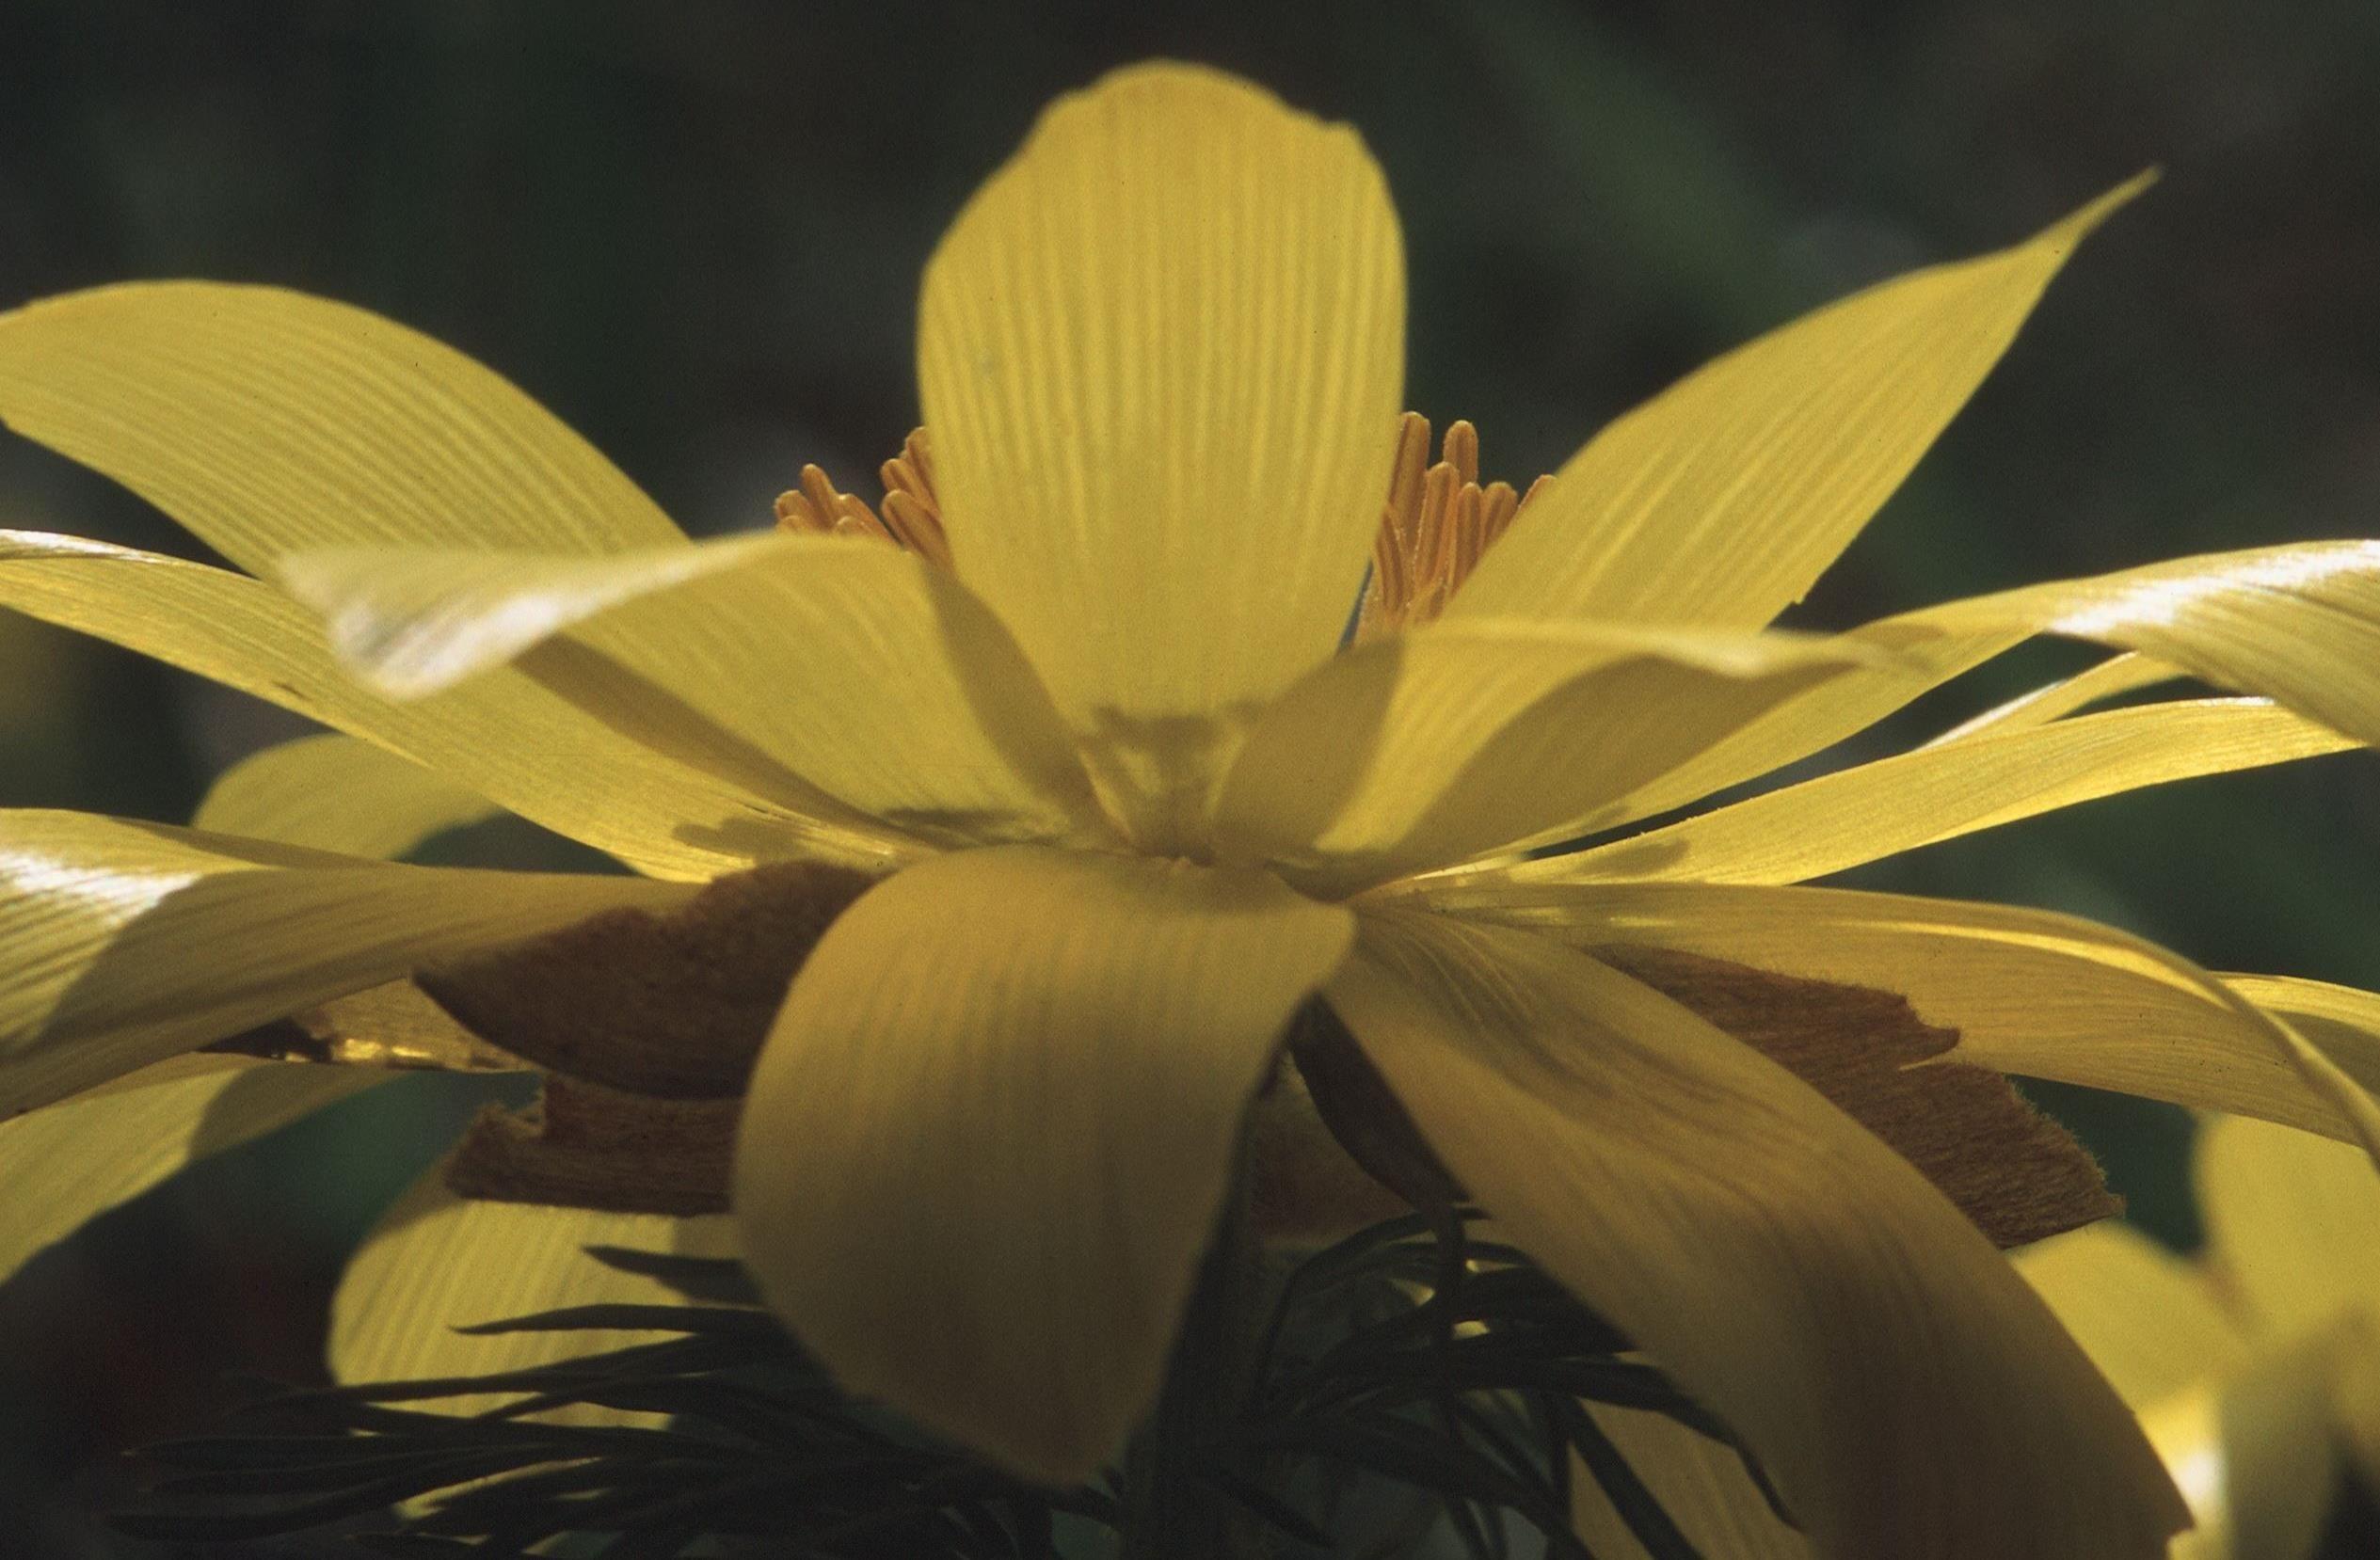 Arontorpsängen - Blomsterlokal